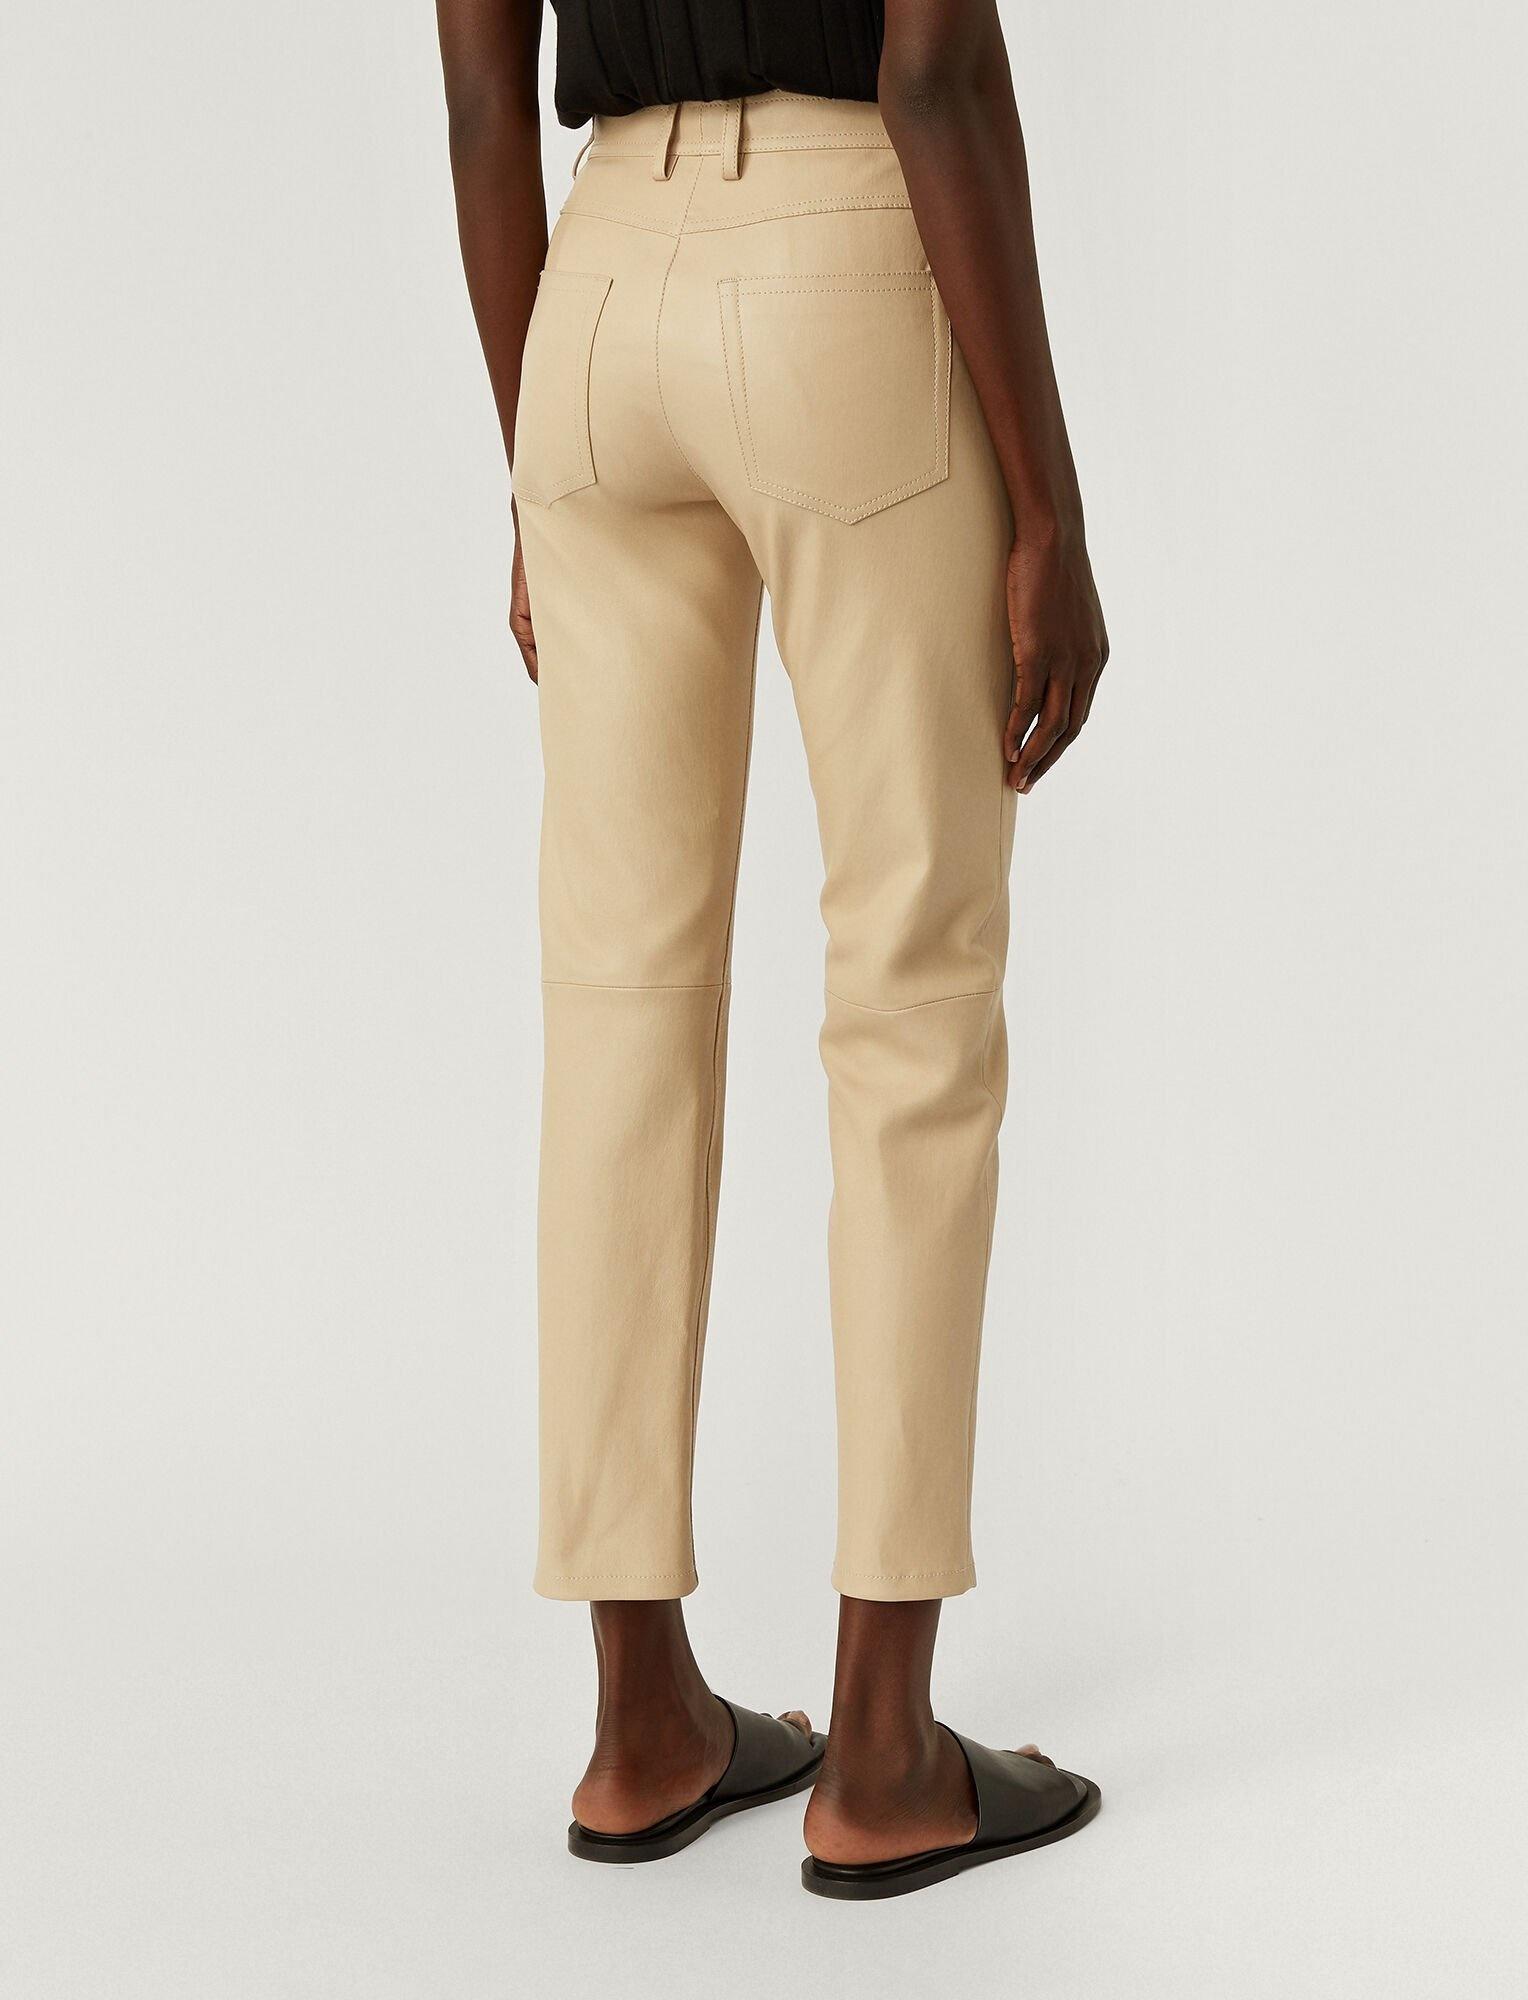 Teddy Leather Stretch Trouser Mastic